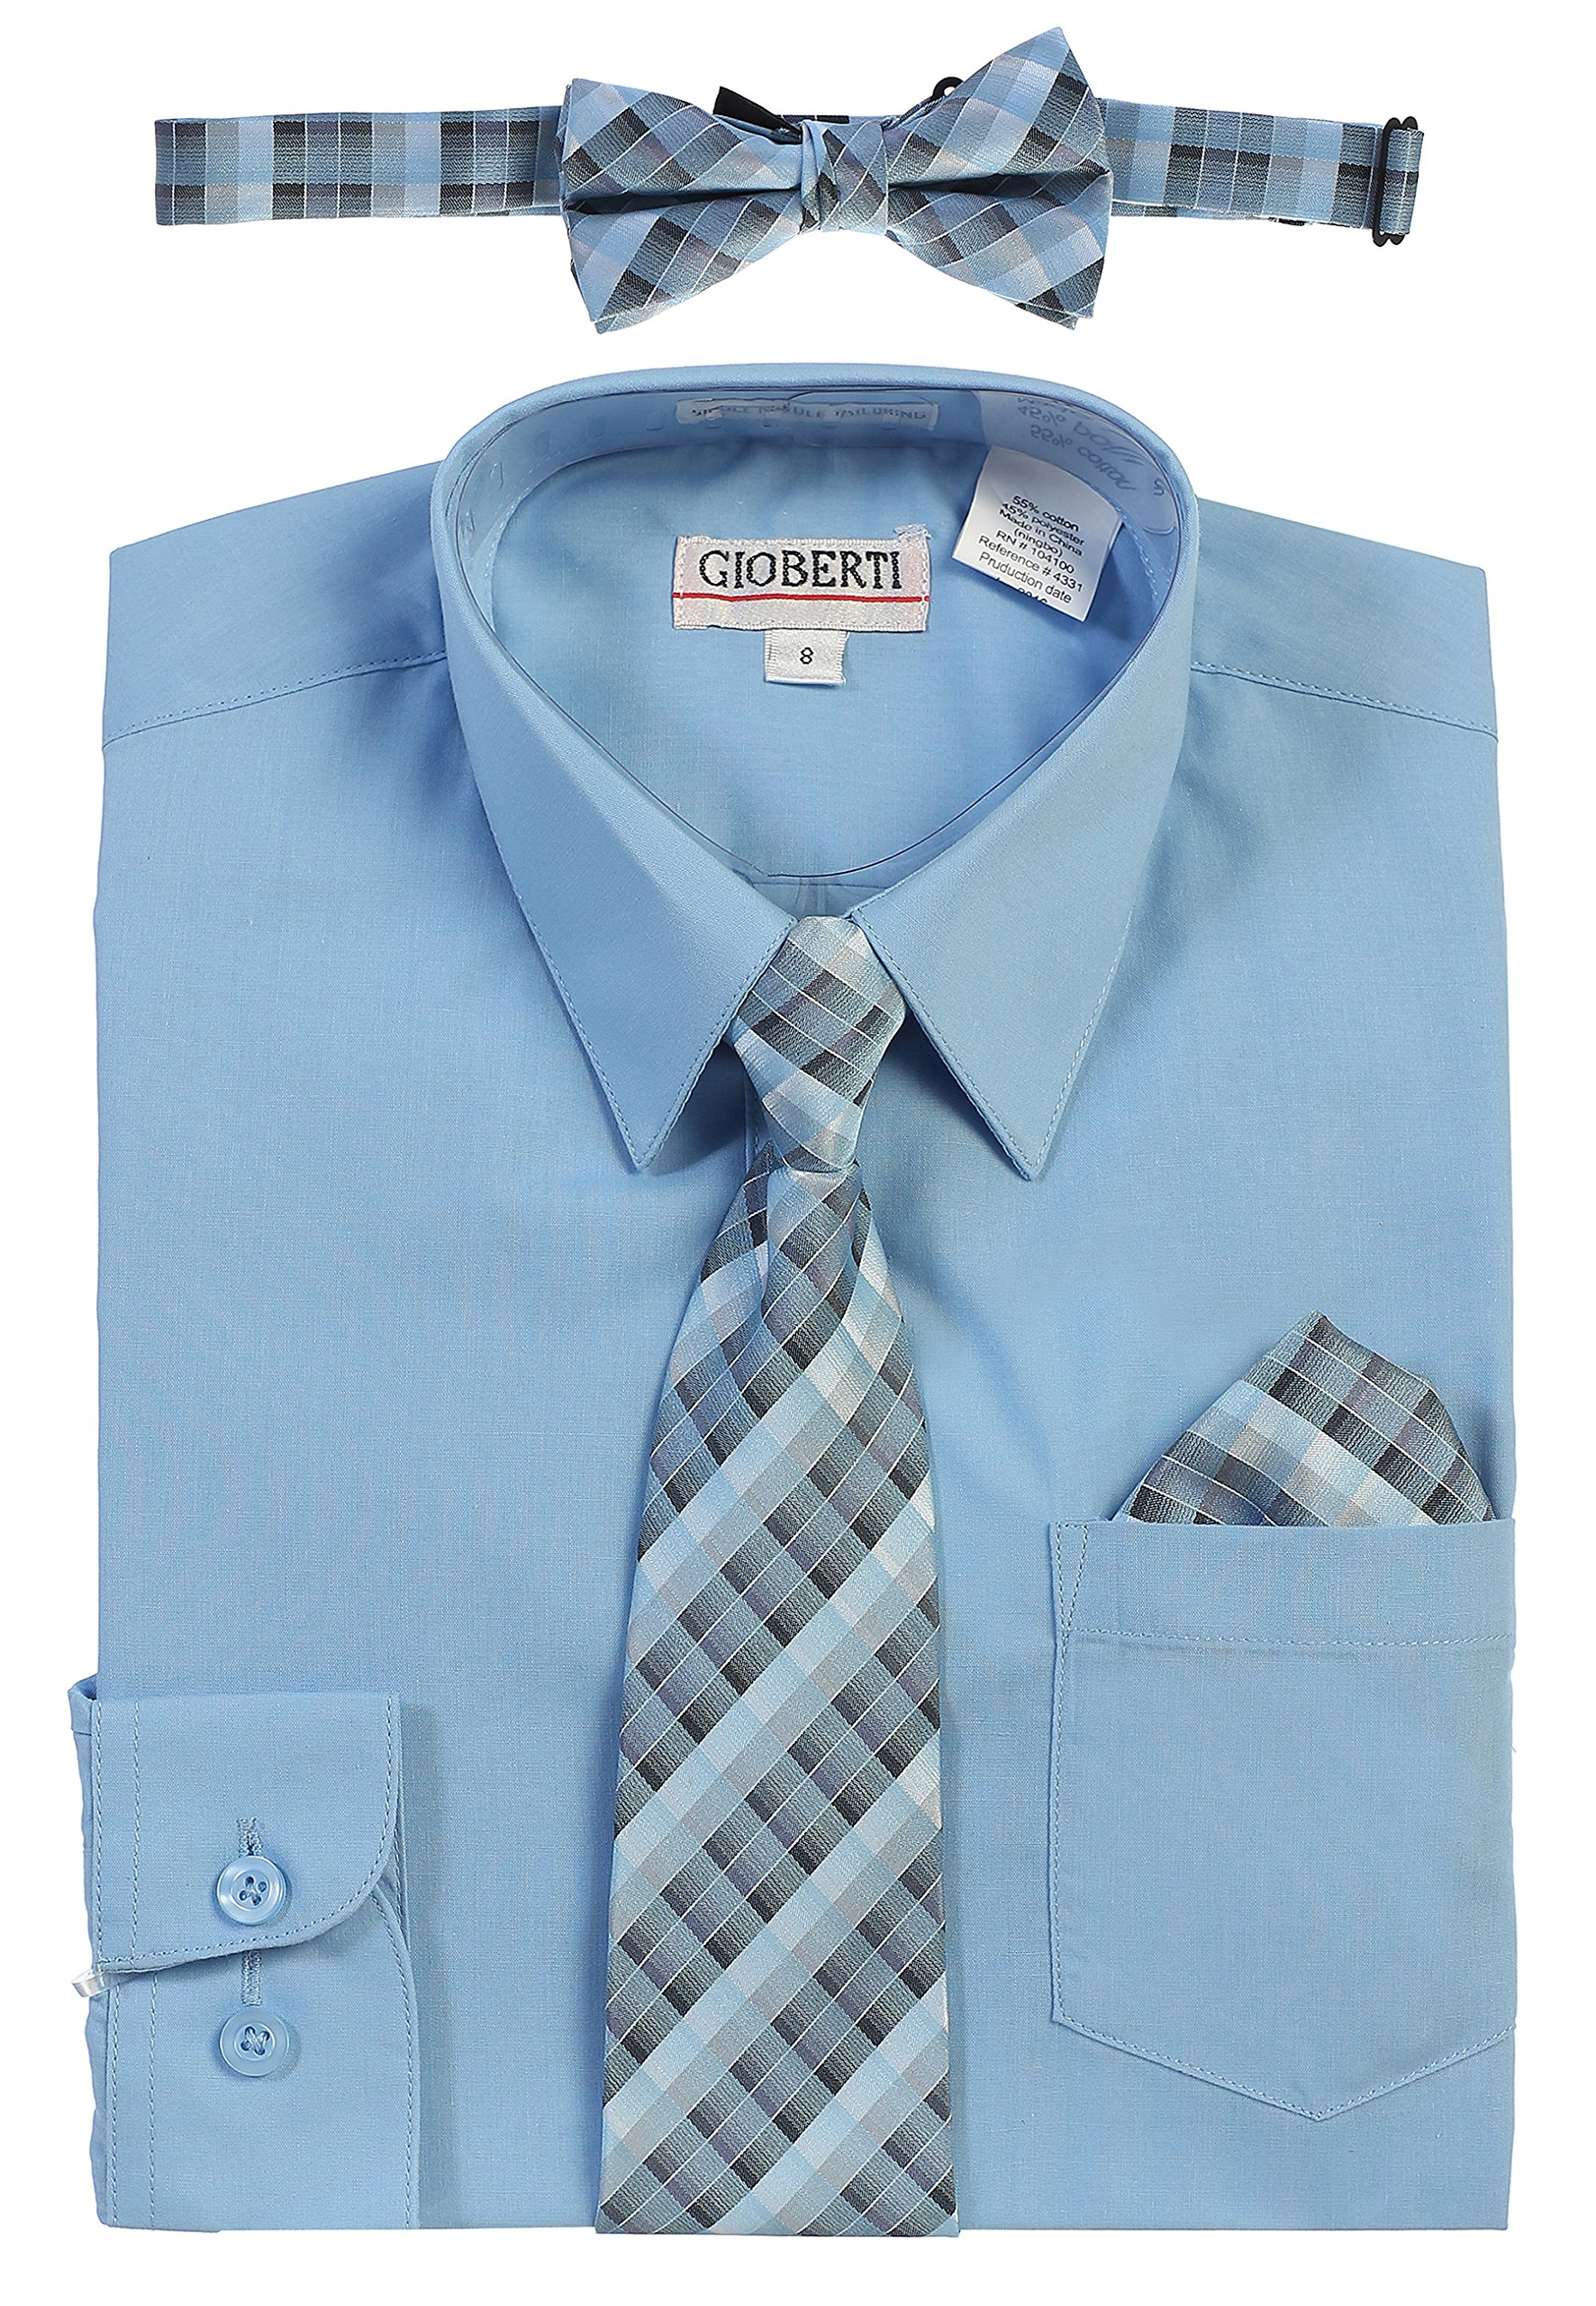 Gioberti Boy's Long Sleeve Dress Shirt and Plaid Tie Set, Sky Blue, Size 7 by Gioberti